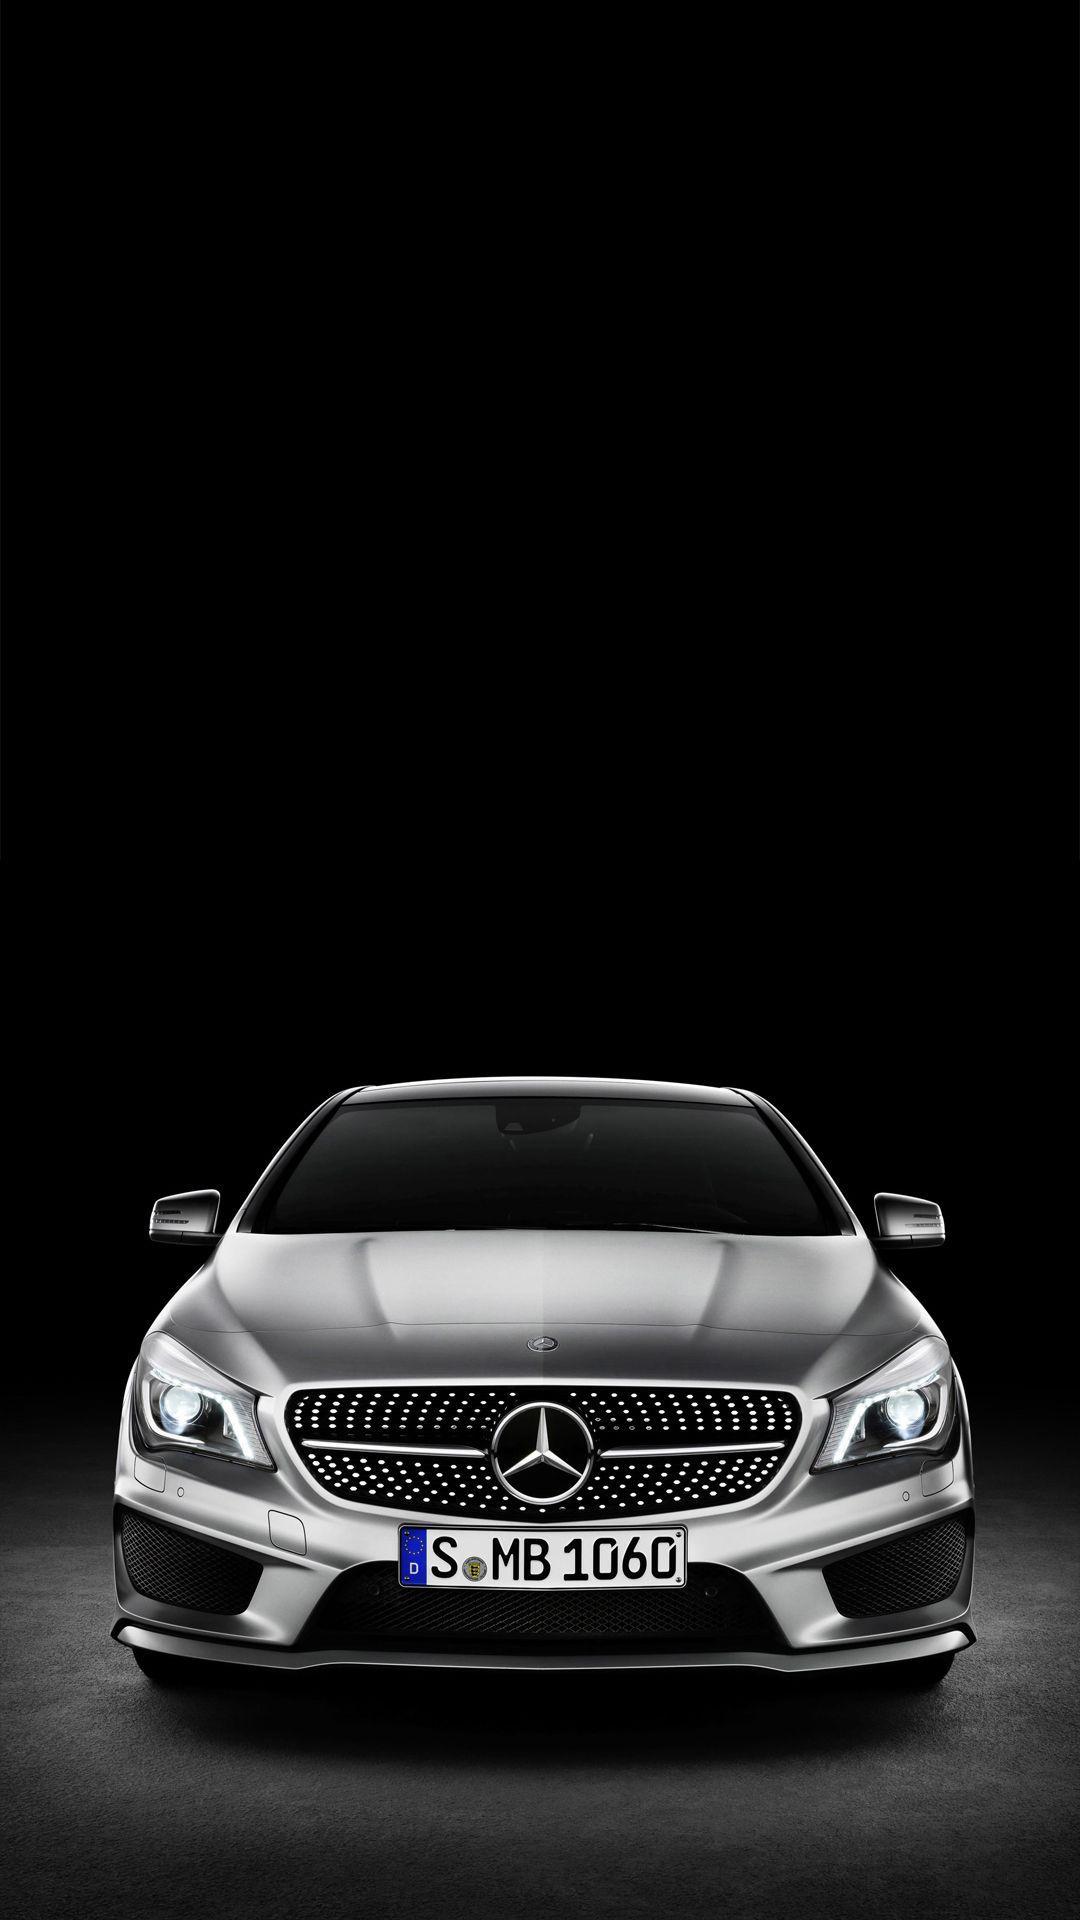 Mercedes Benz Htc Wallpapers Top Free Mercedes Benz Htc